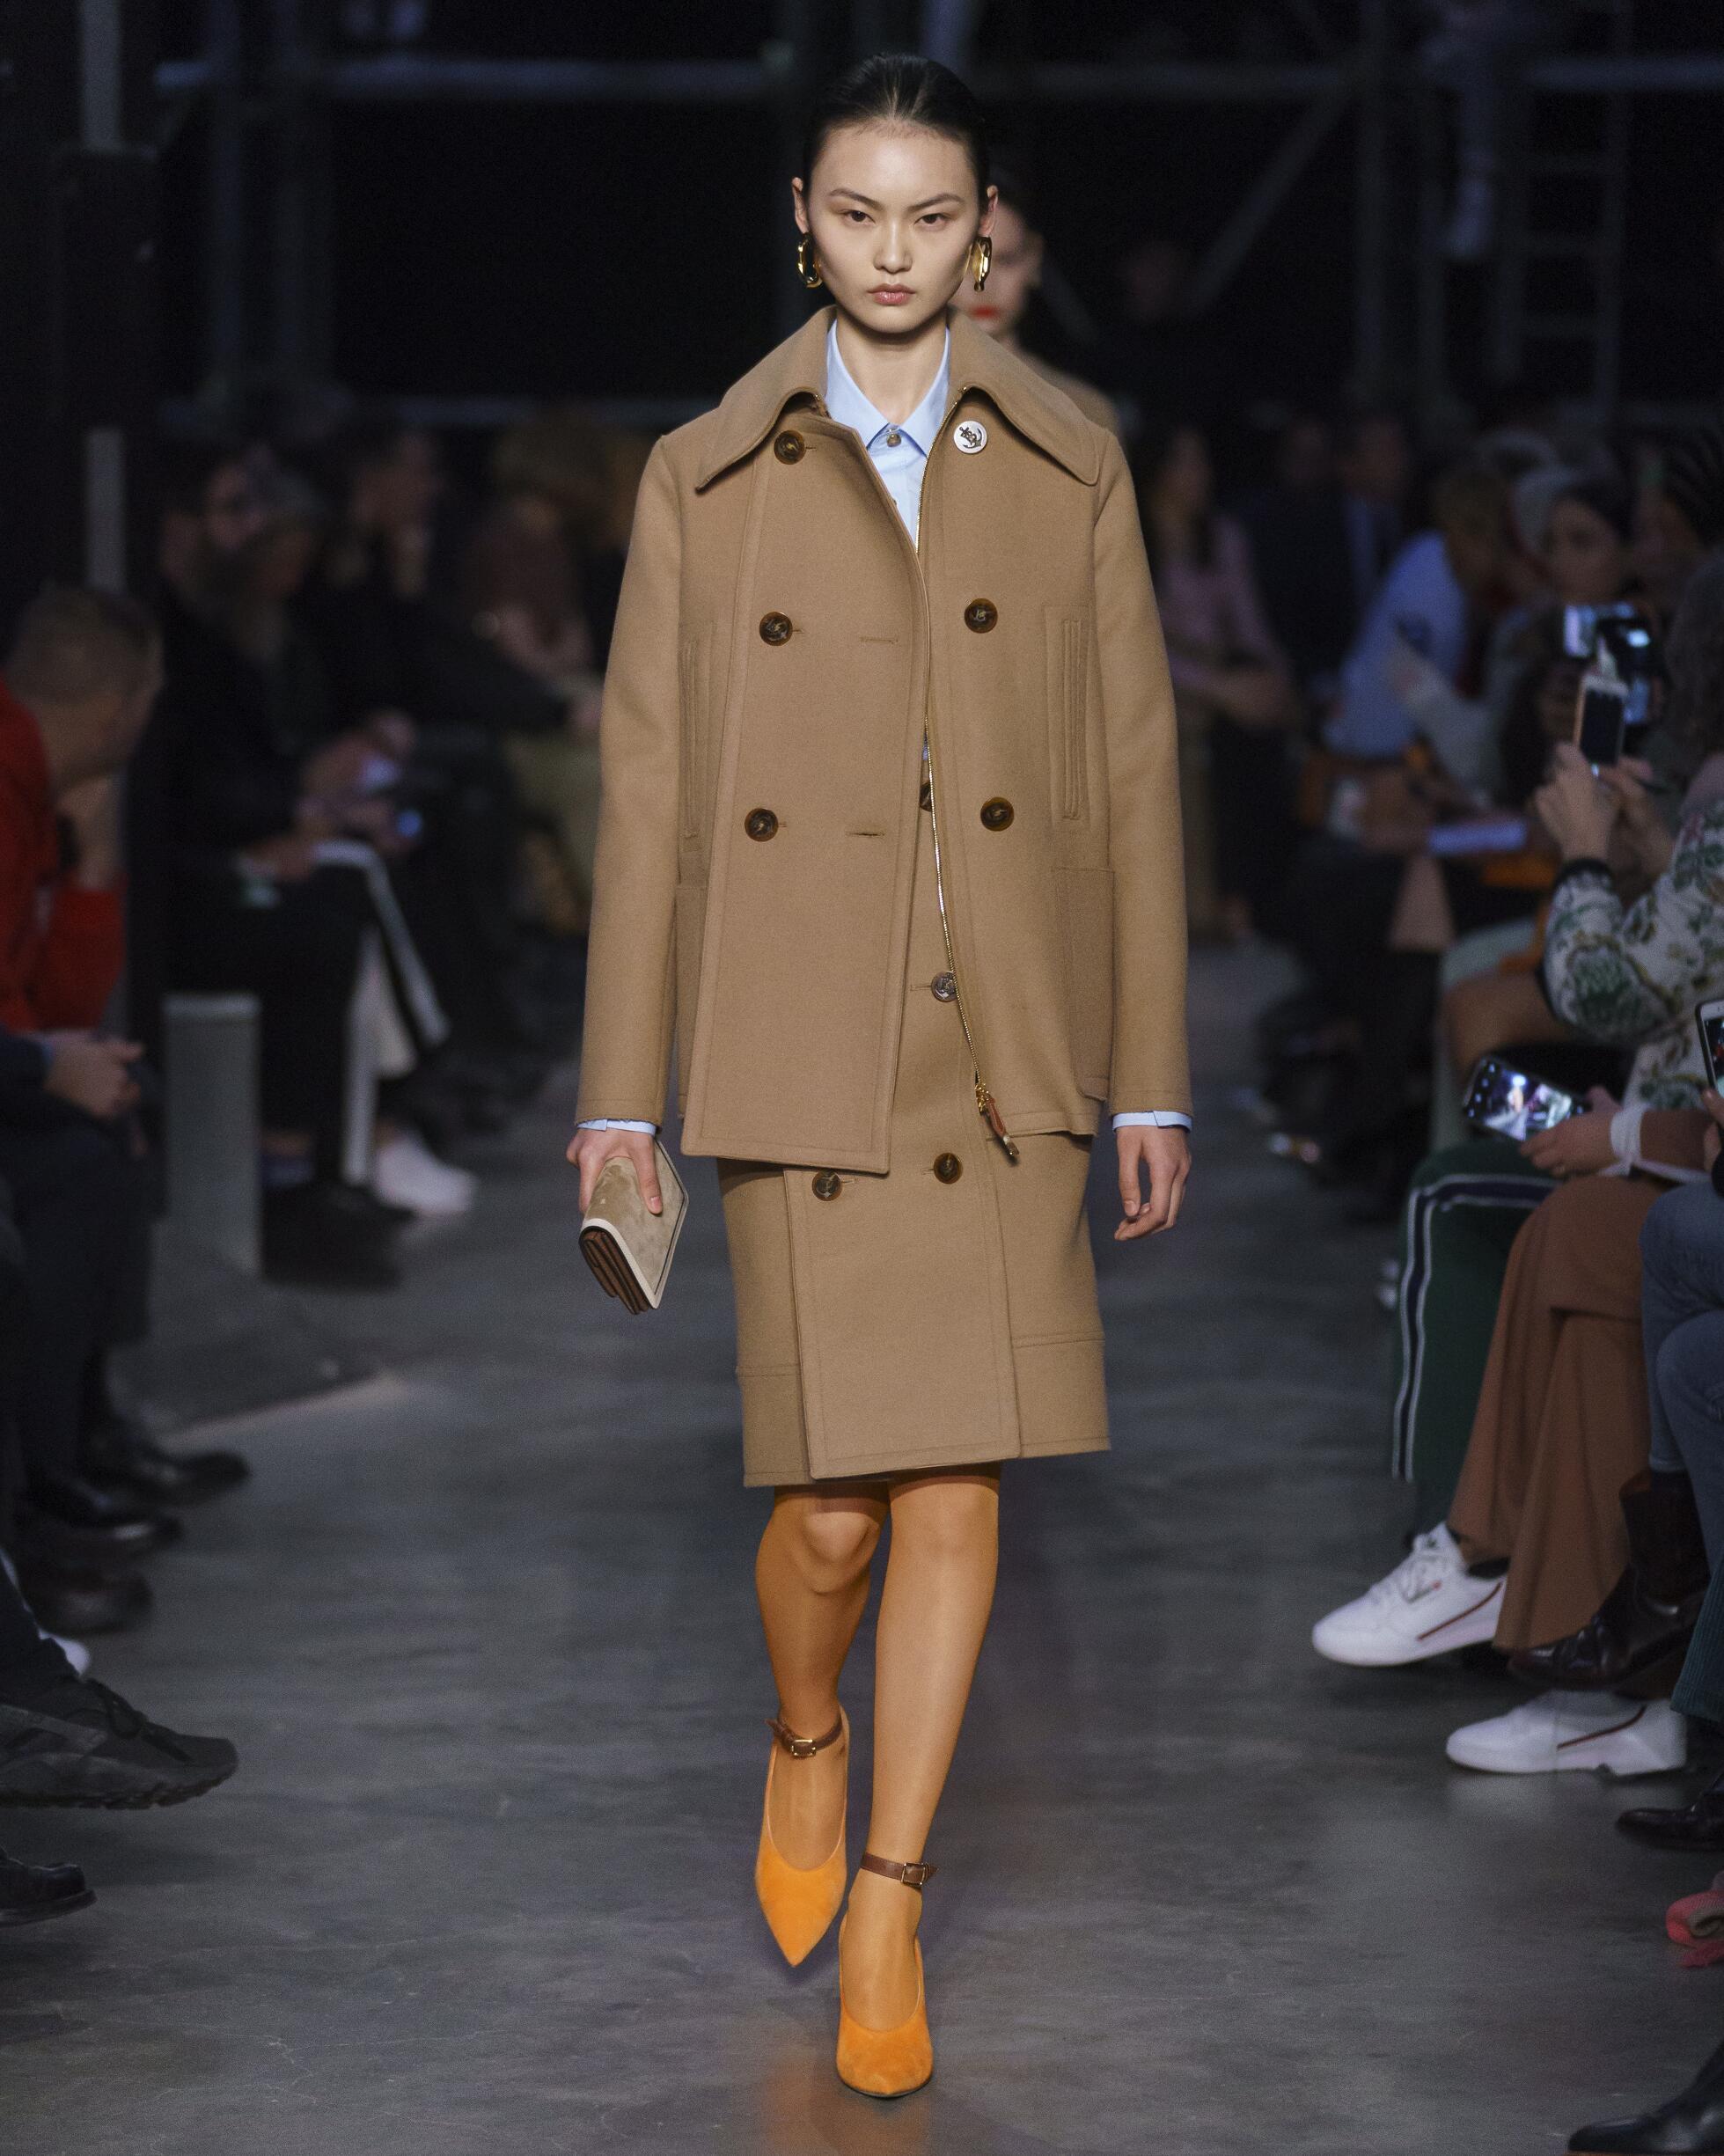 2019 Burberry Catwalk London Fashion Week